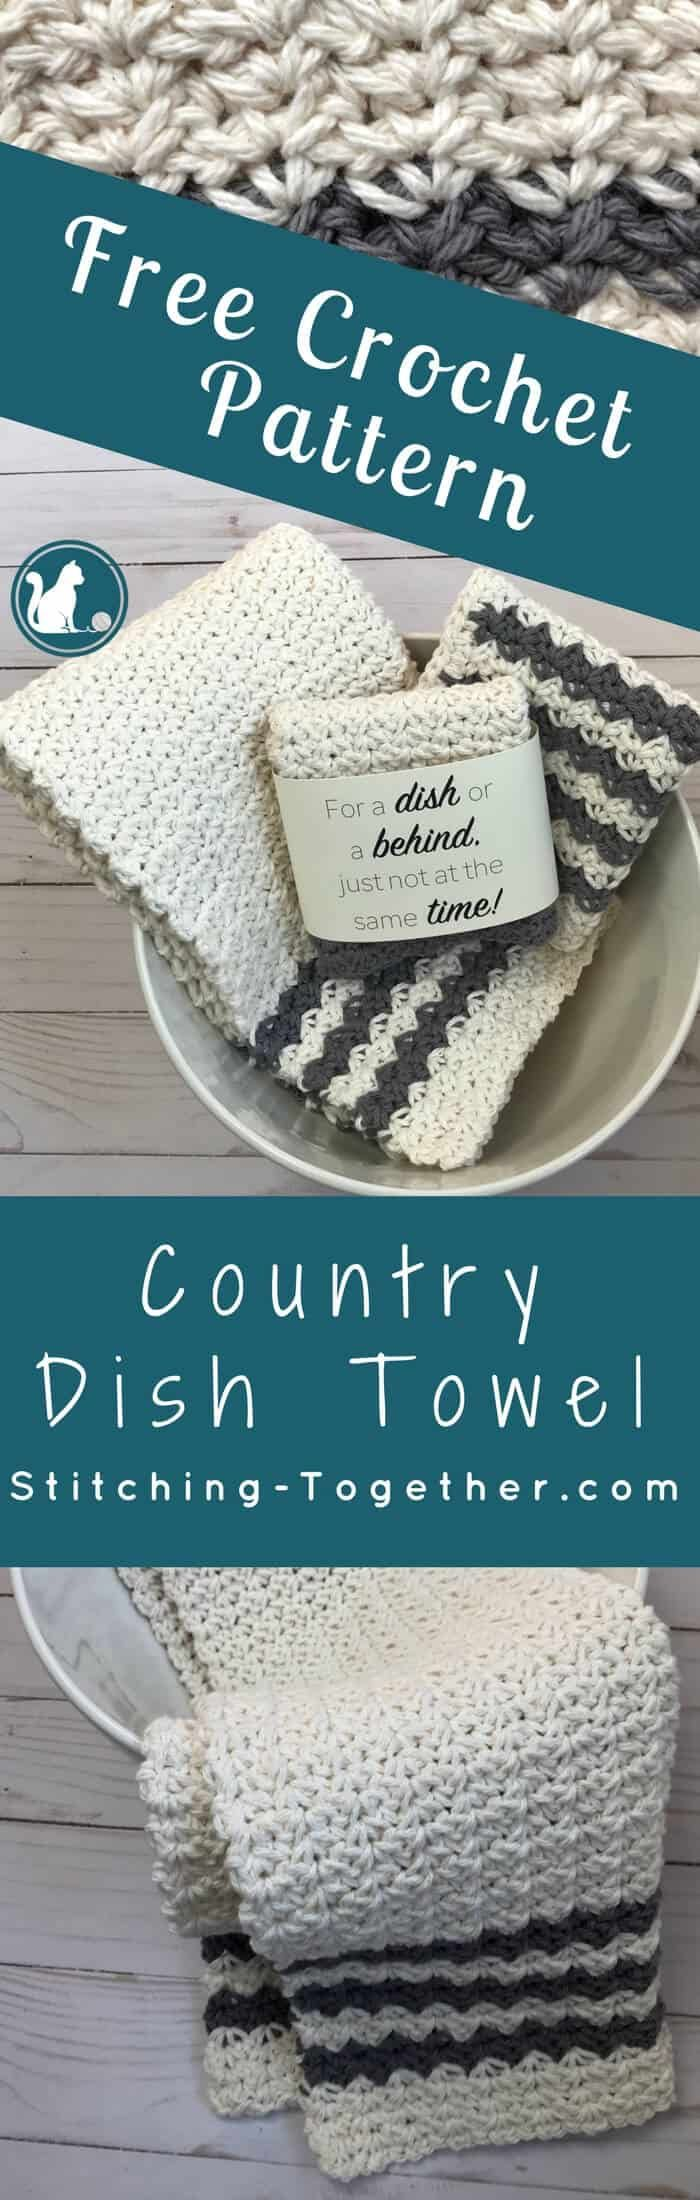 Crochet Country Dish Towel #dishtowels